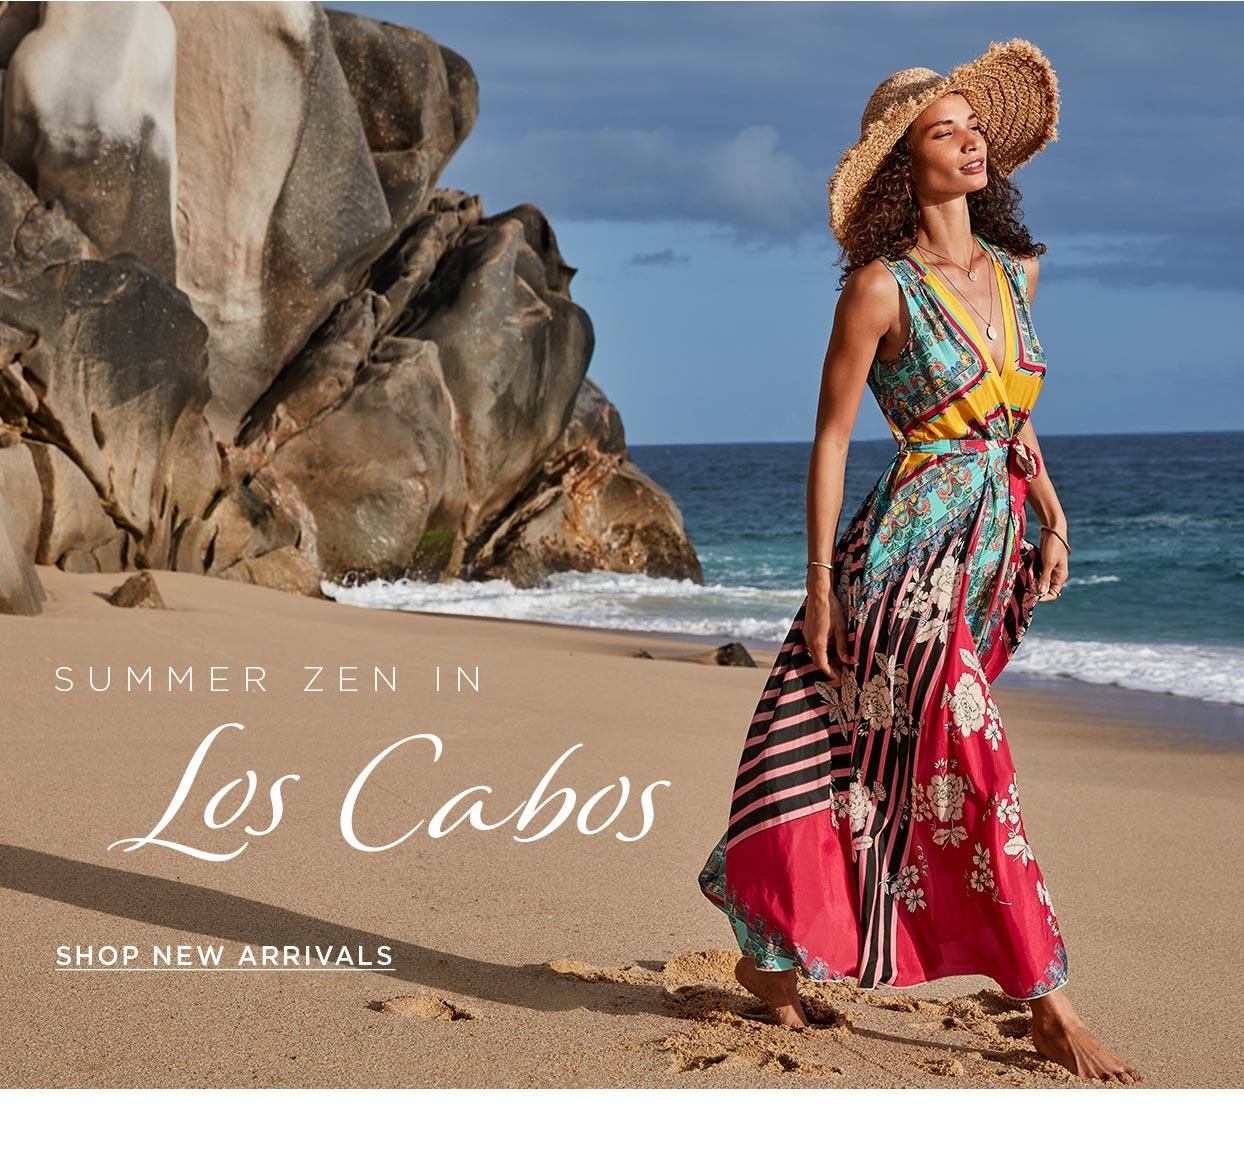 Summer Zen in Los Cabos - Shop New Arrivals